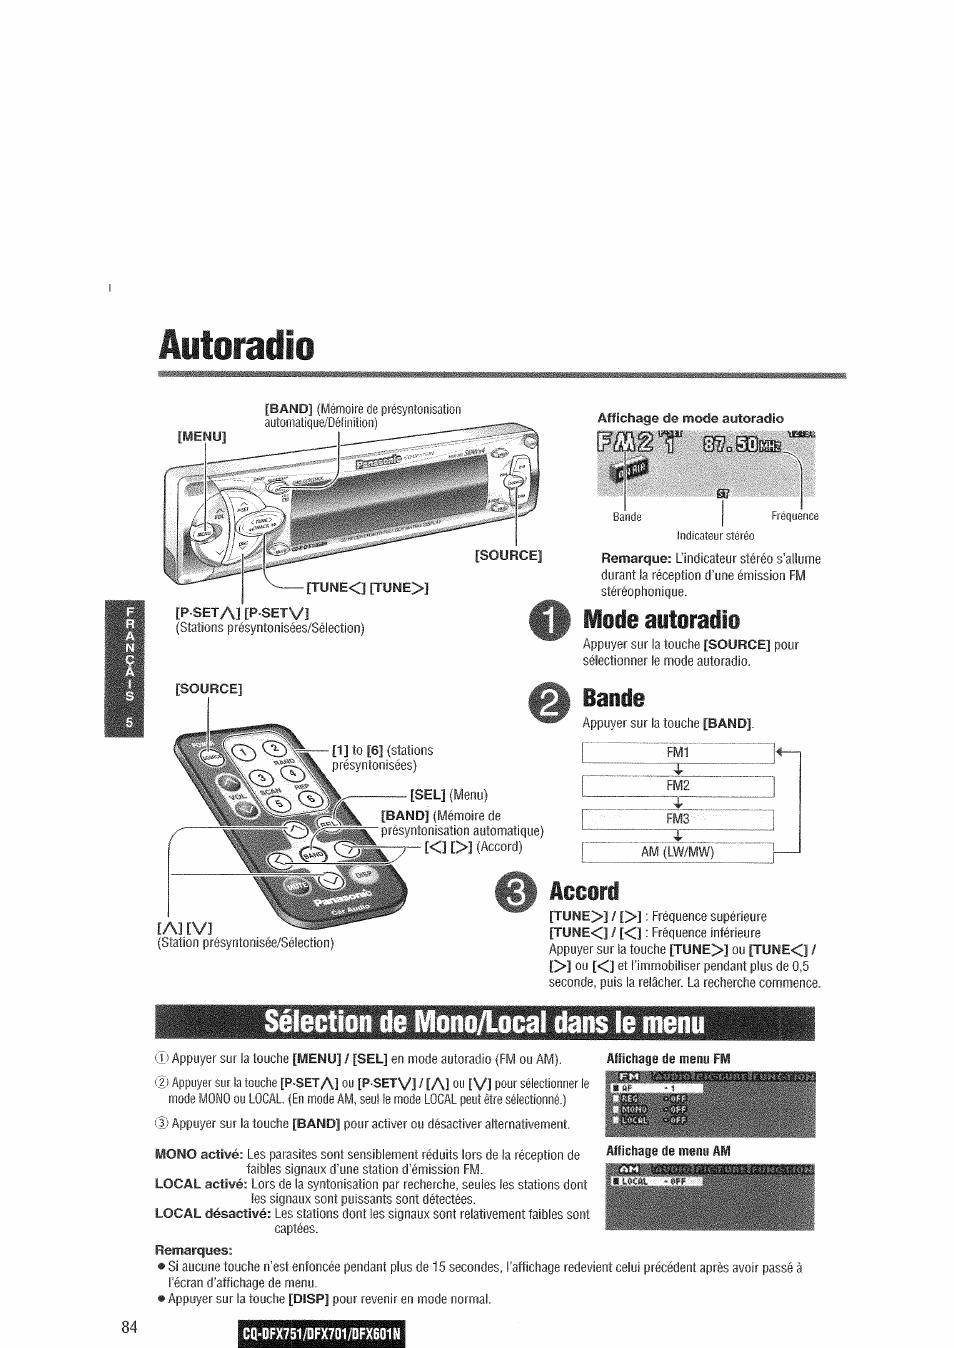 Autoradio, Sélection de mono/local dans le menu, Mode autoradio   Bande,